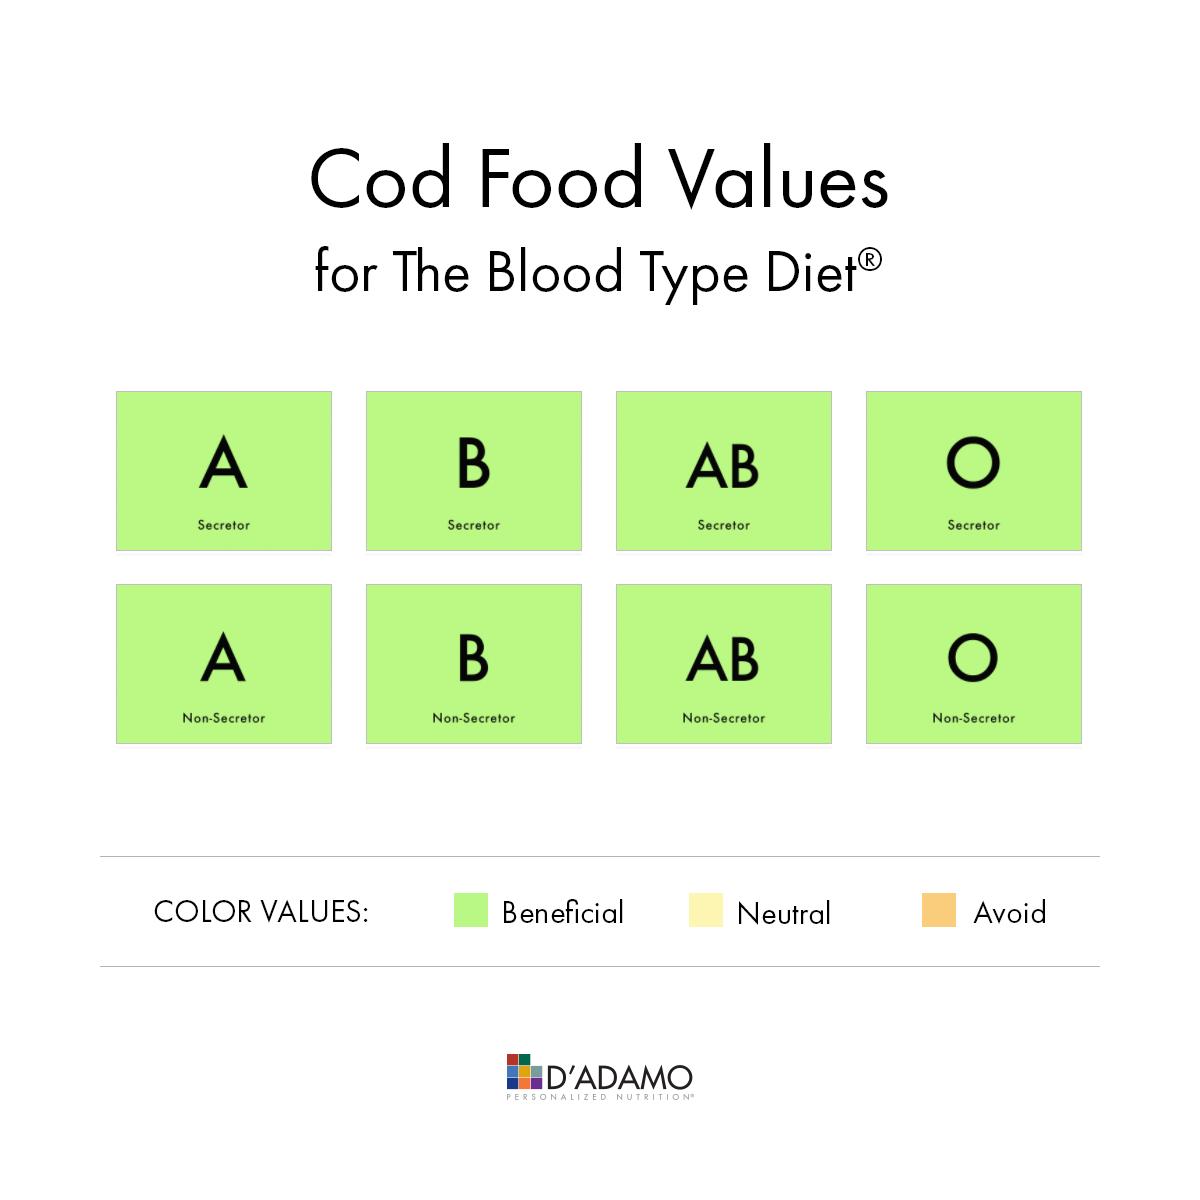 Cod - Blood Type Diet Food Values